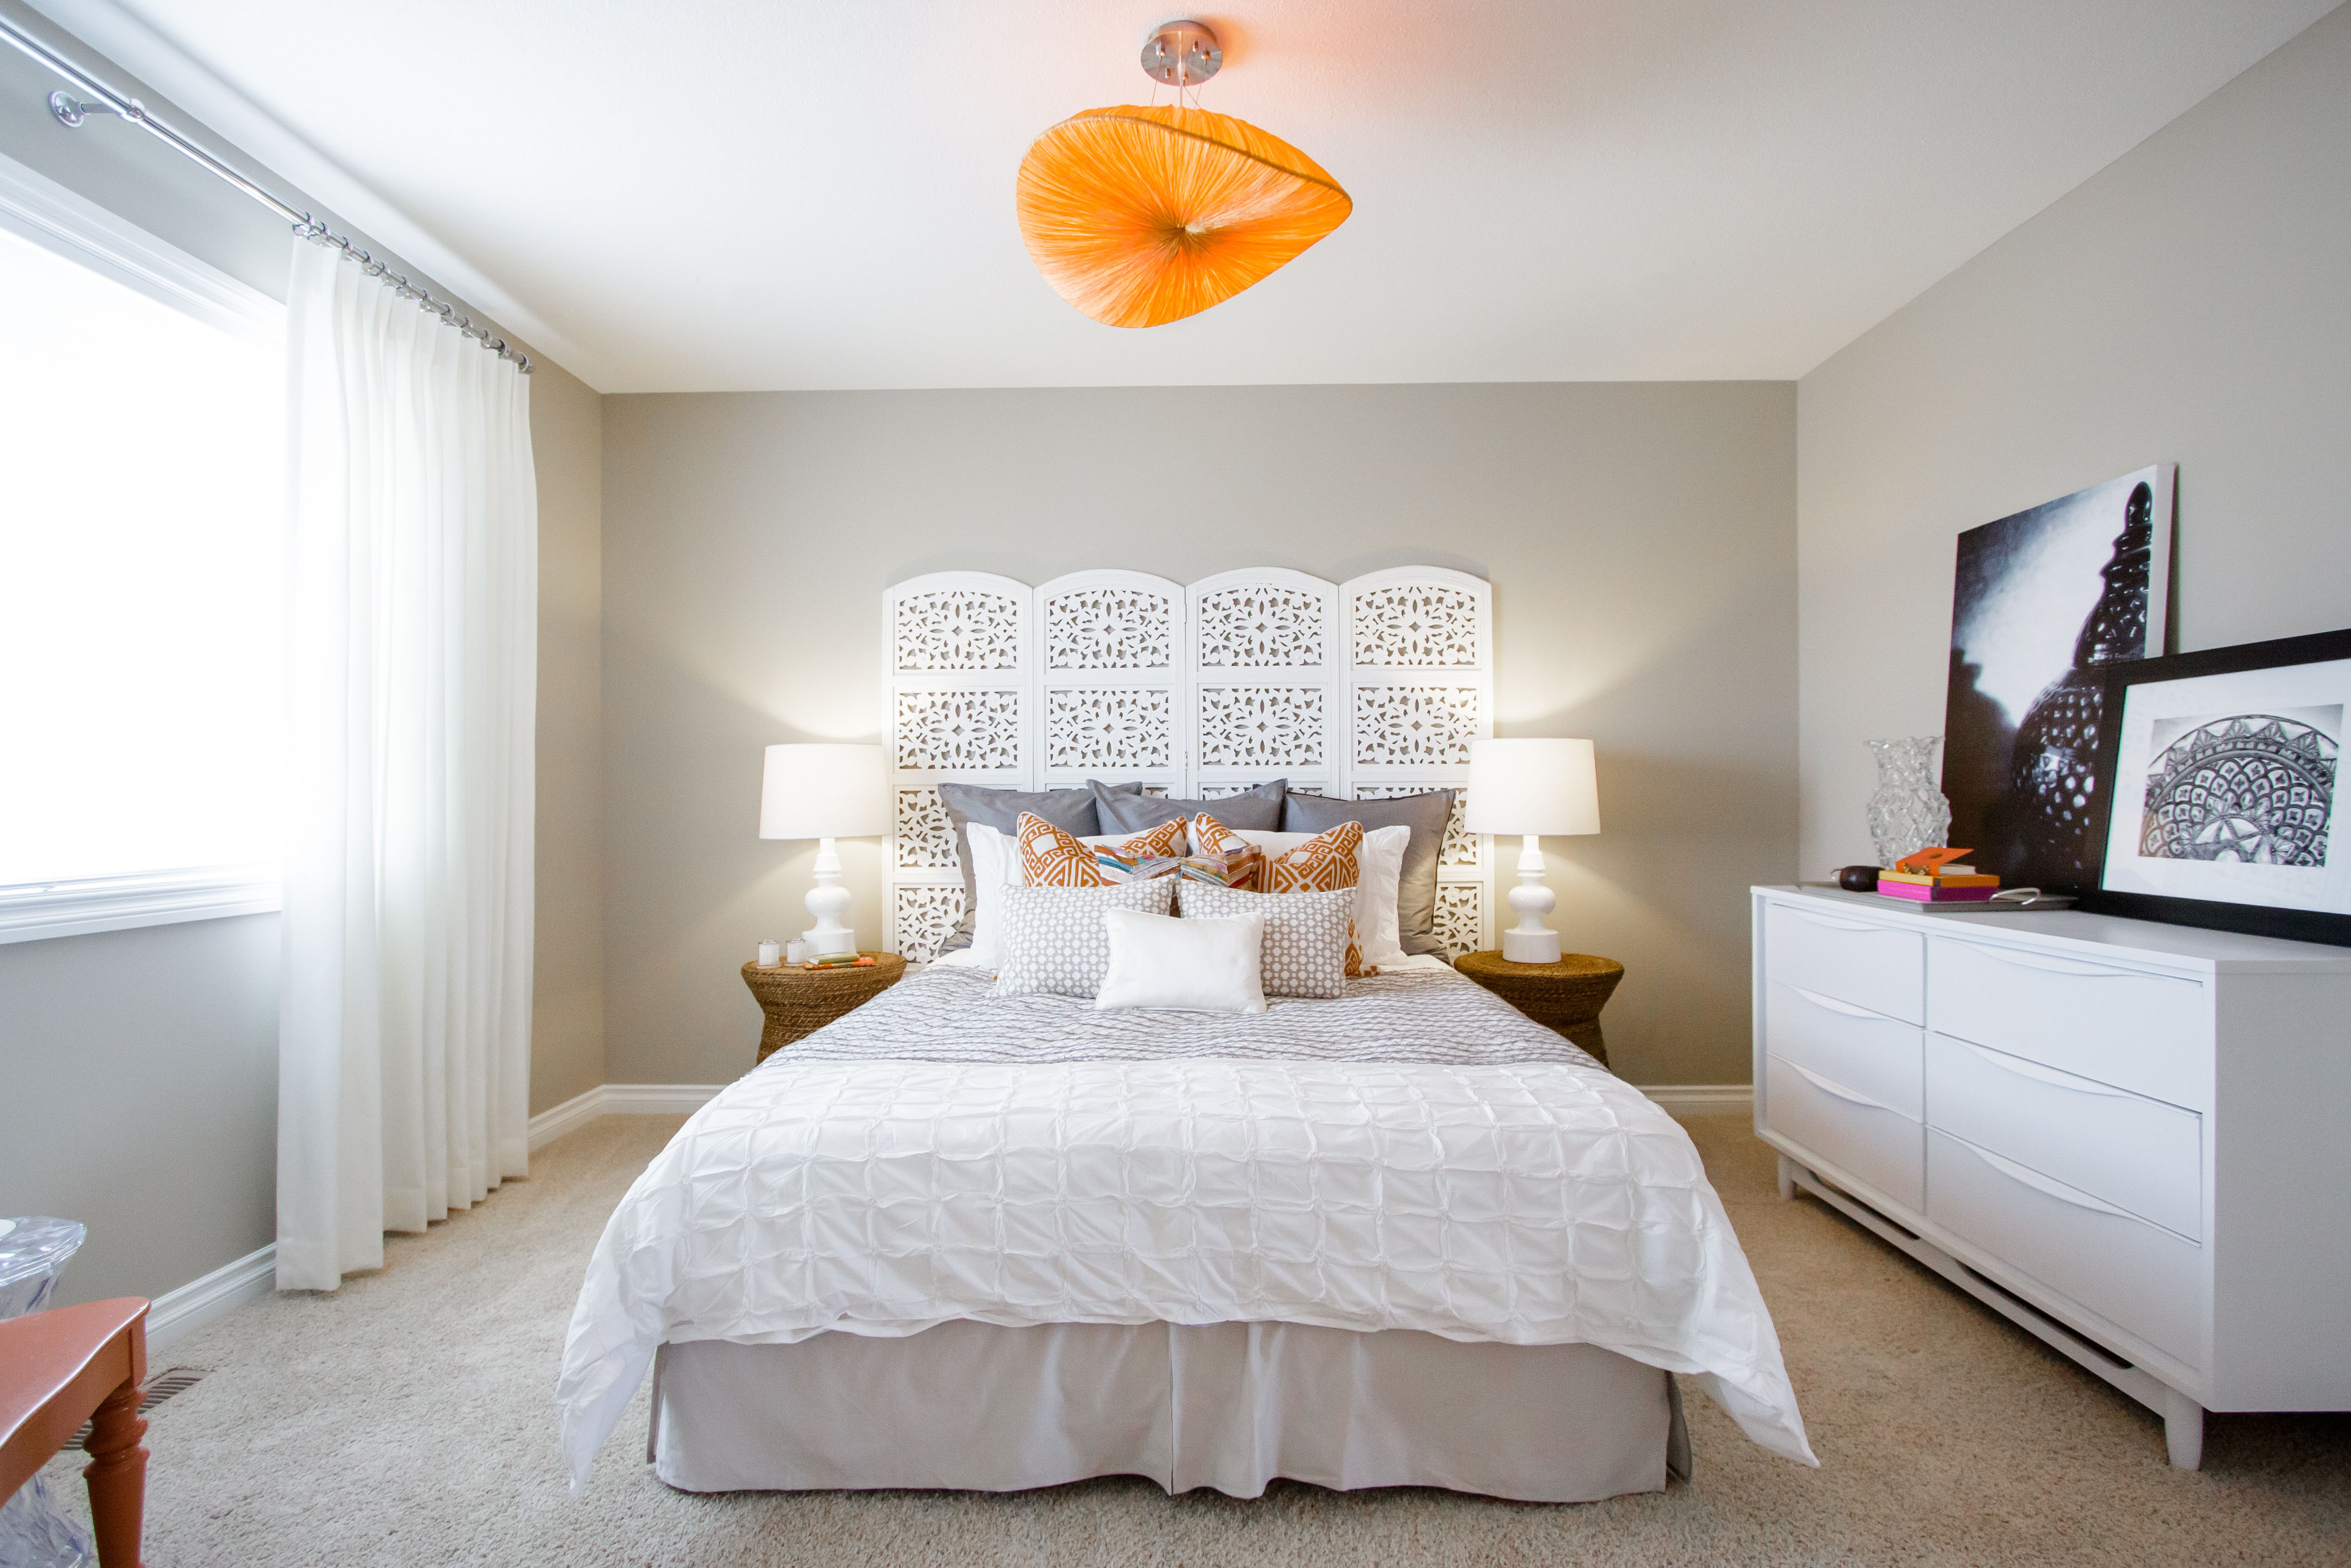 design bedroom ideas india decobizz com designs interior kitchen